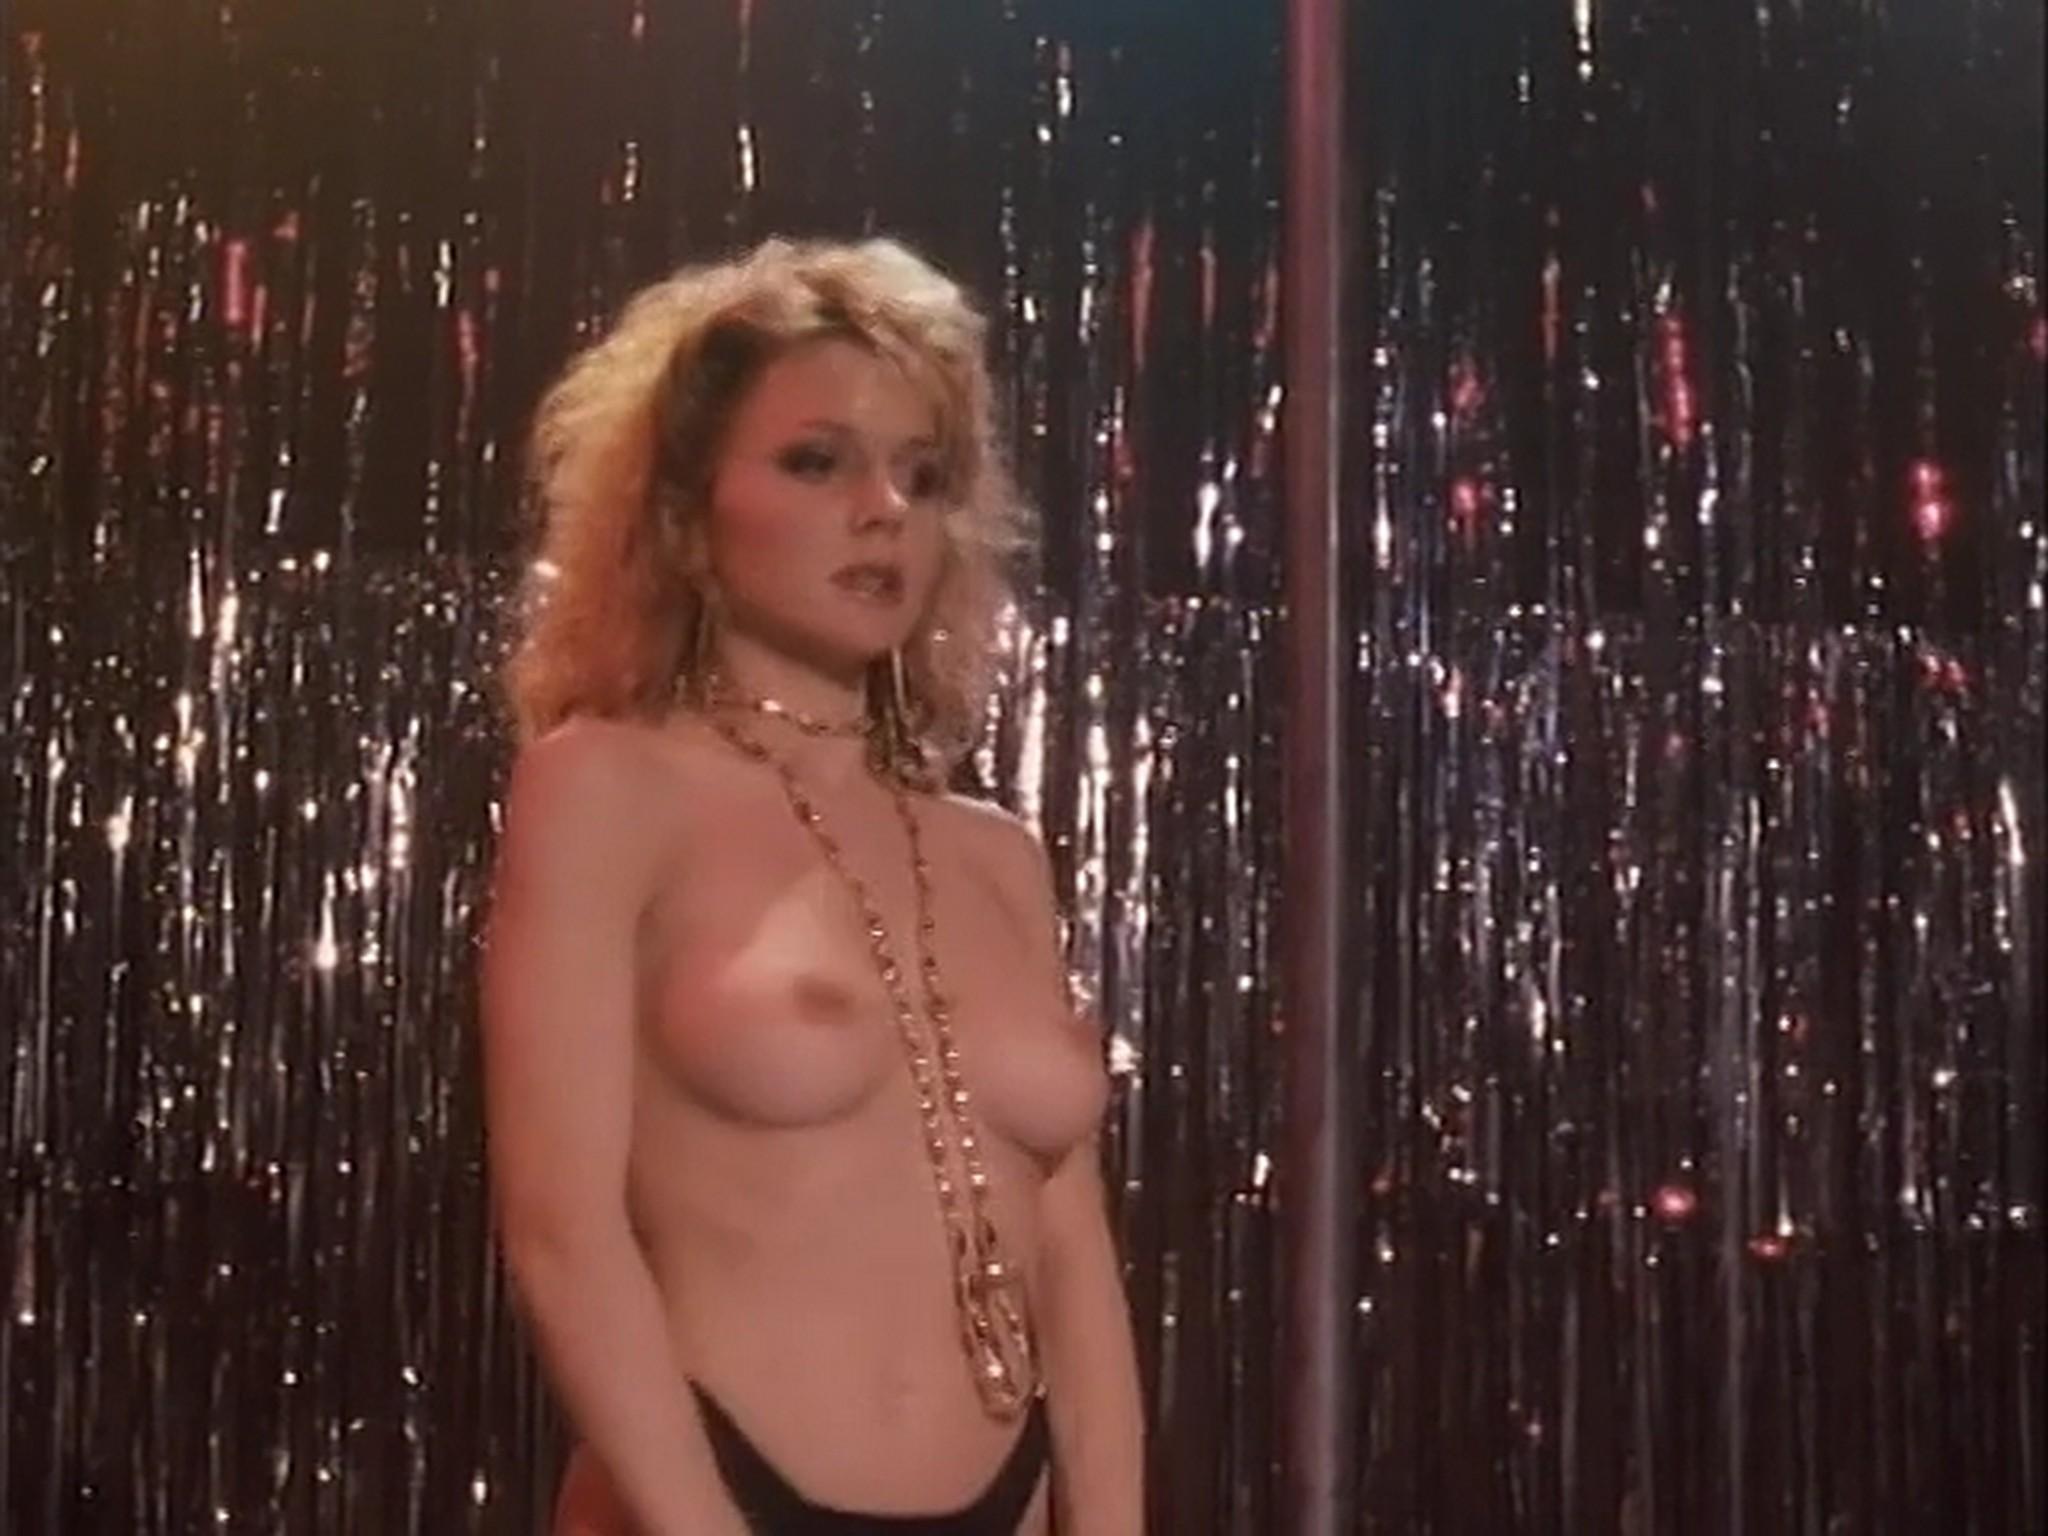 Barbara Alyn Woods nude Catya Sassoon Jill Pierce nude too as strippers Dance with Death 1991 8